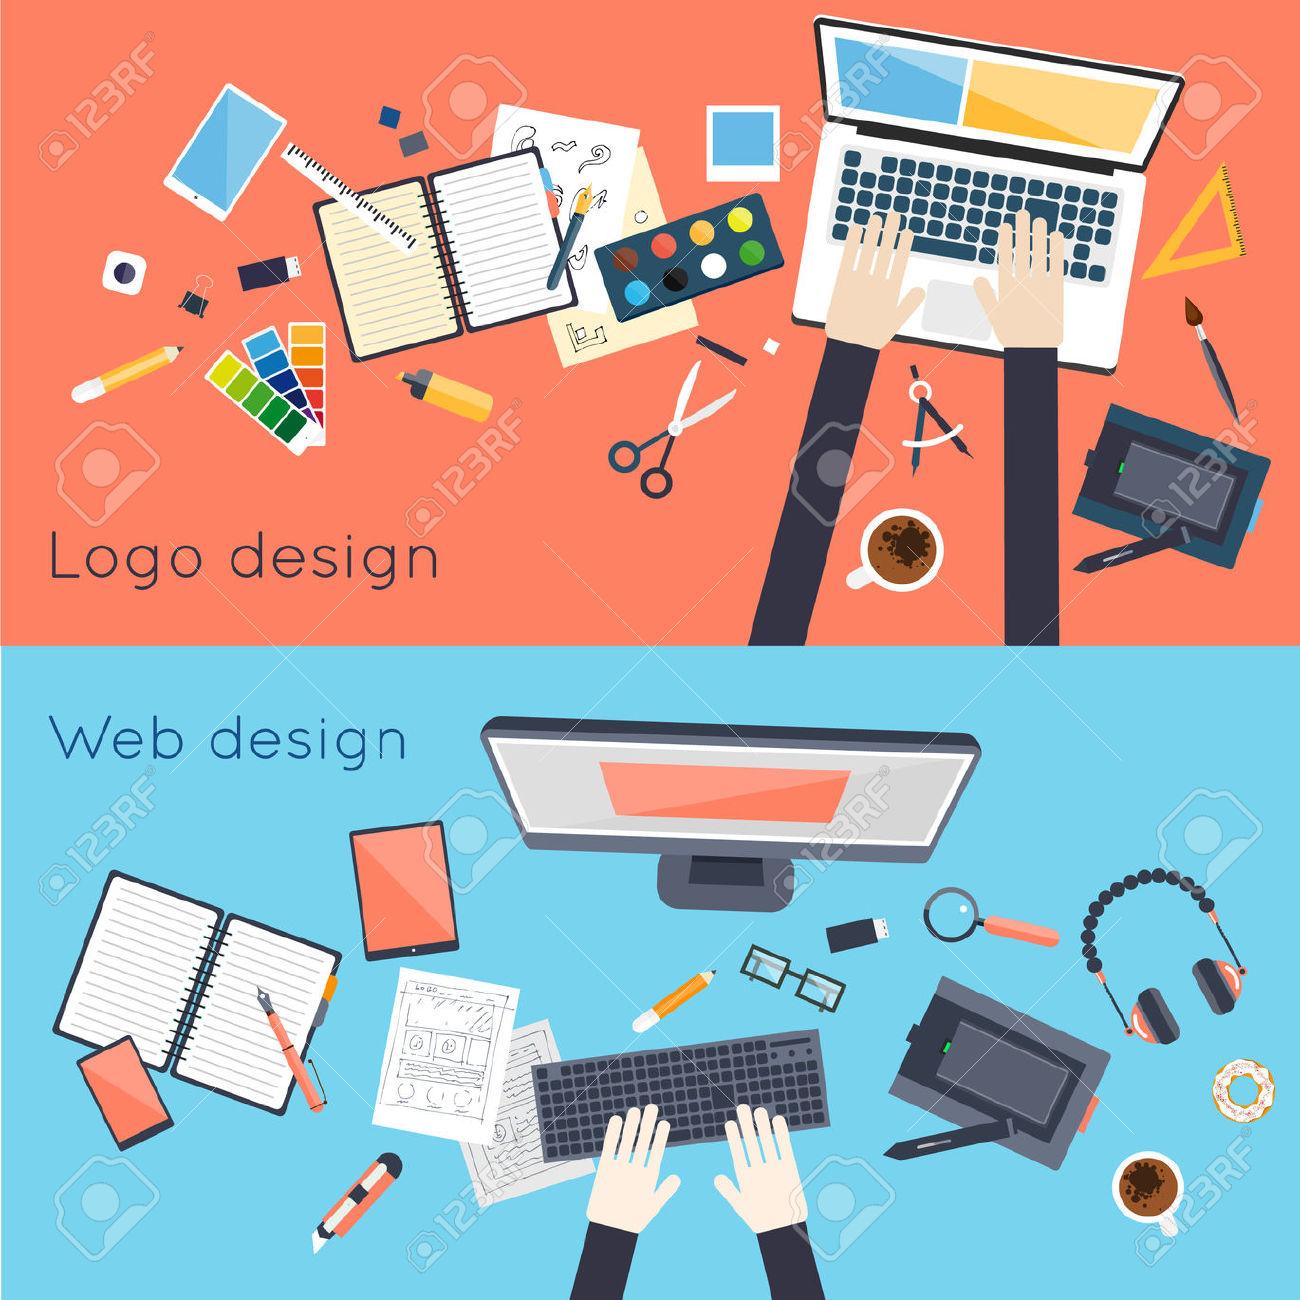 Logo vector clipart graphic design programs image black and white download Logo vector clipart graphic design programs - ClipartFest image black and white download